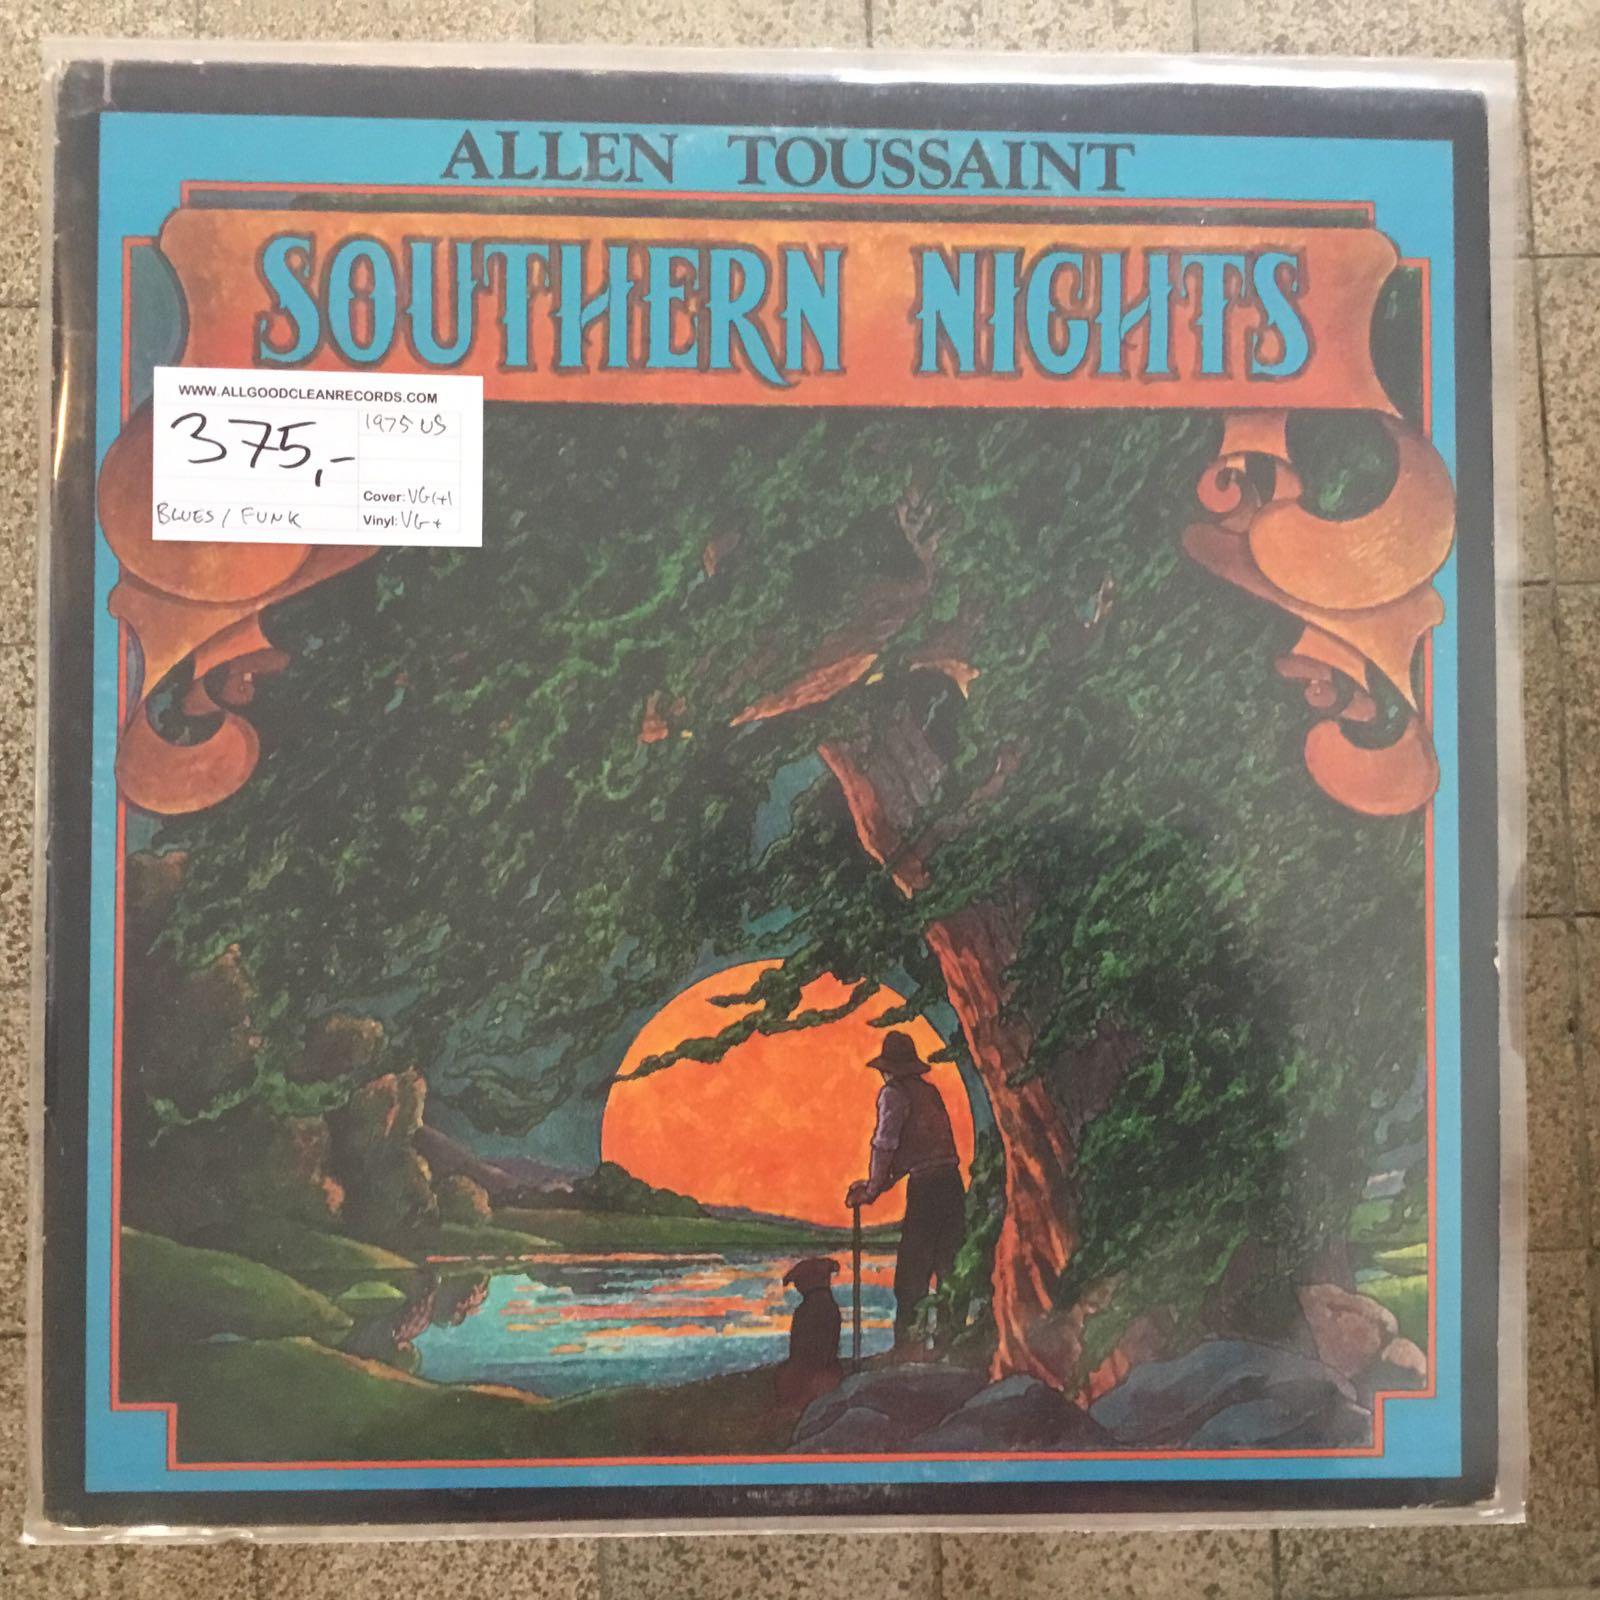 Allen Toussaint – Southern Nights [LP] (2. hand)